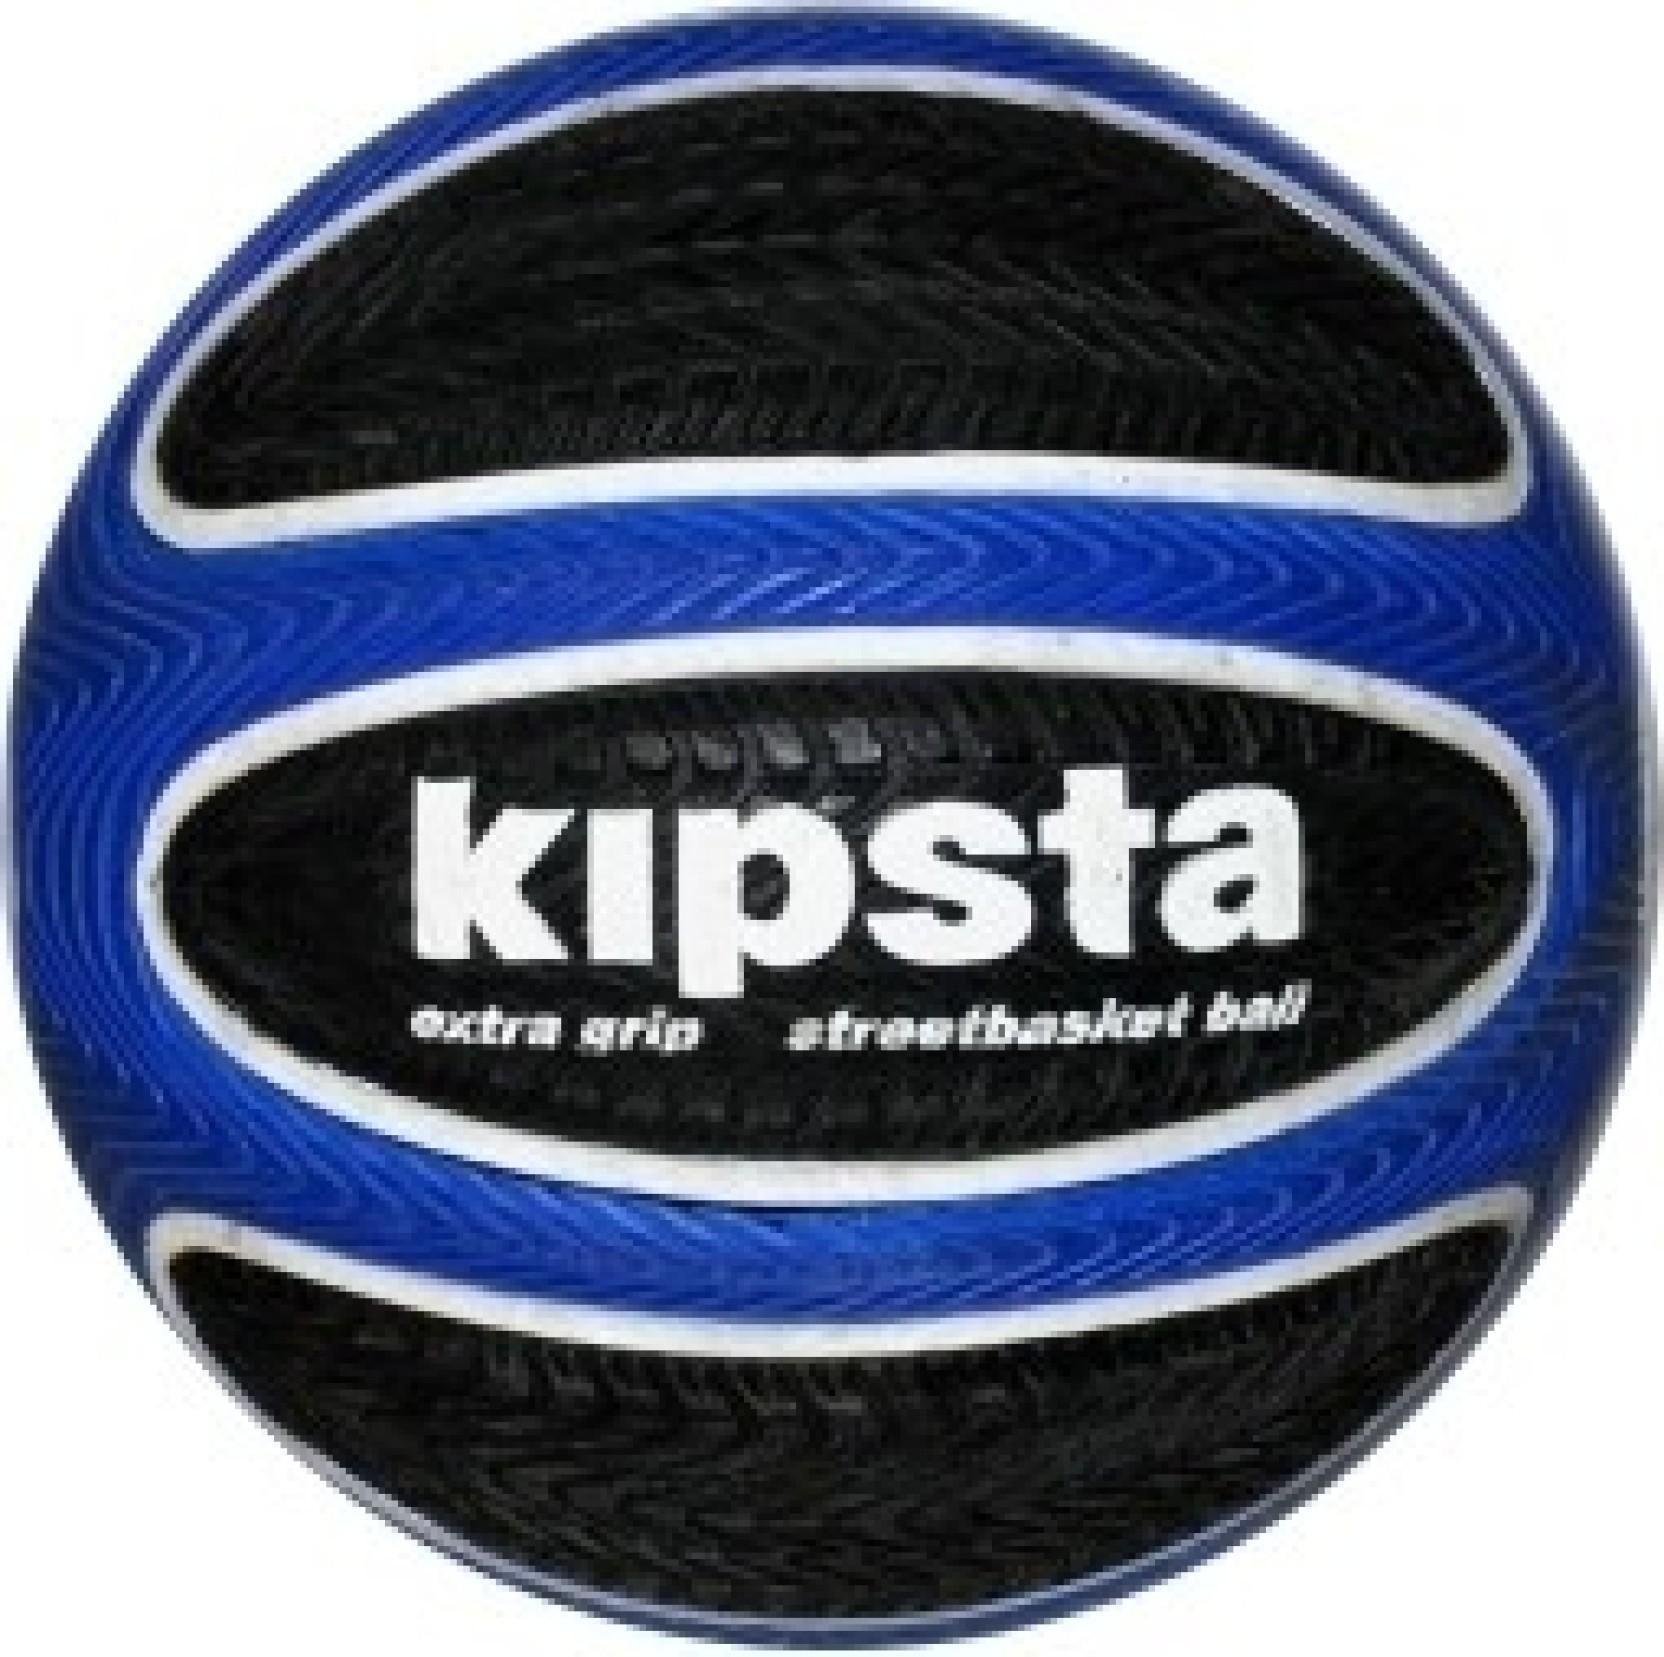 Kipsta decathlon tarmak basketball size buy kipsta jpg 1664x1657 Kipsta  basketball f547052b894f